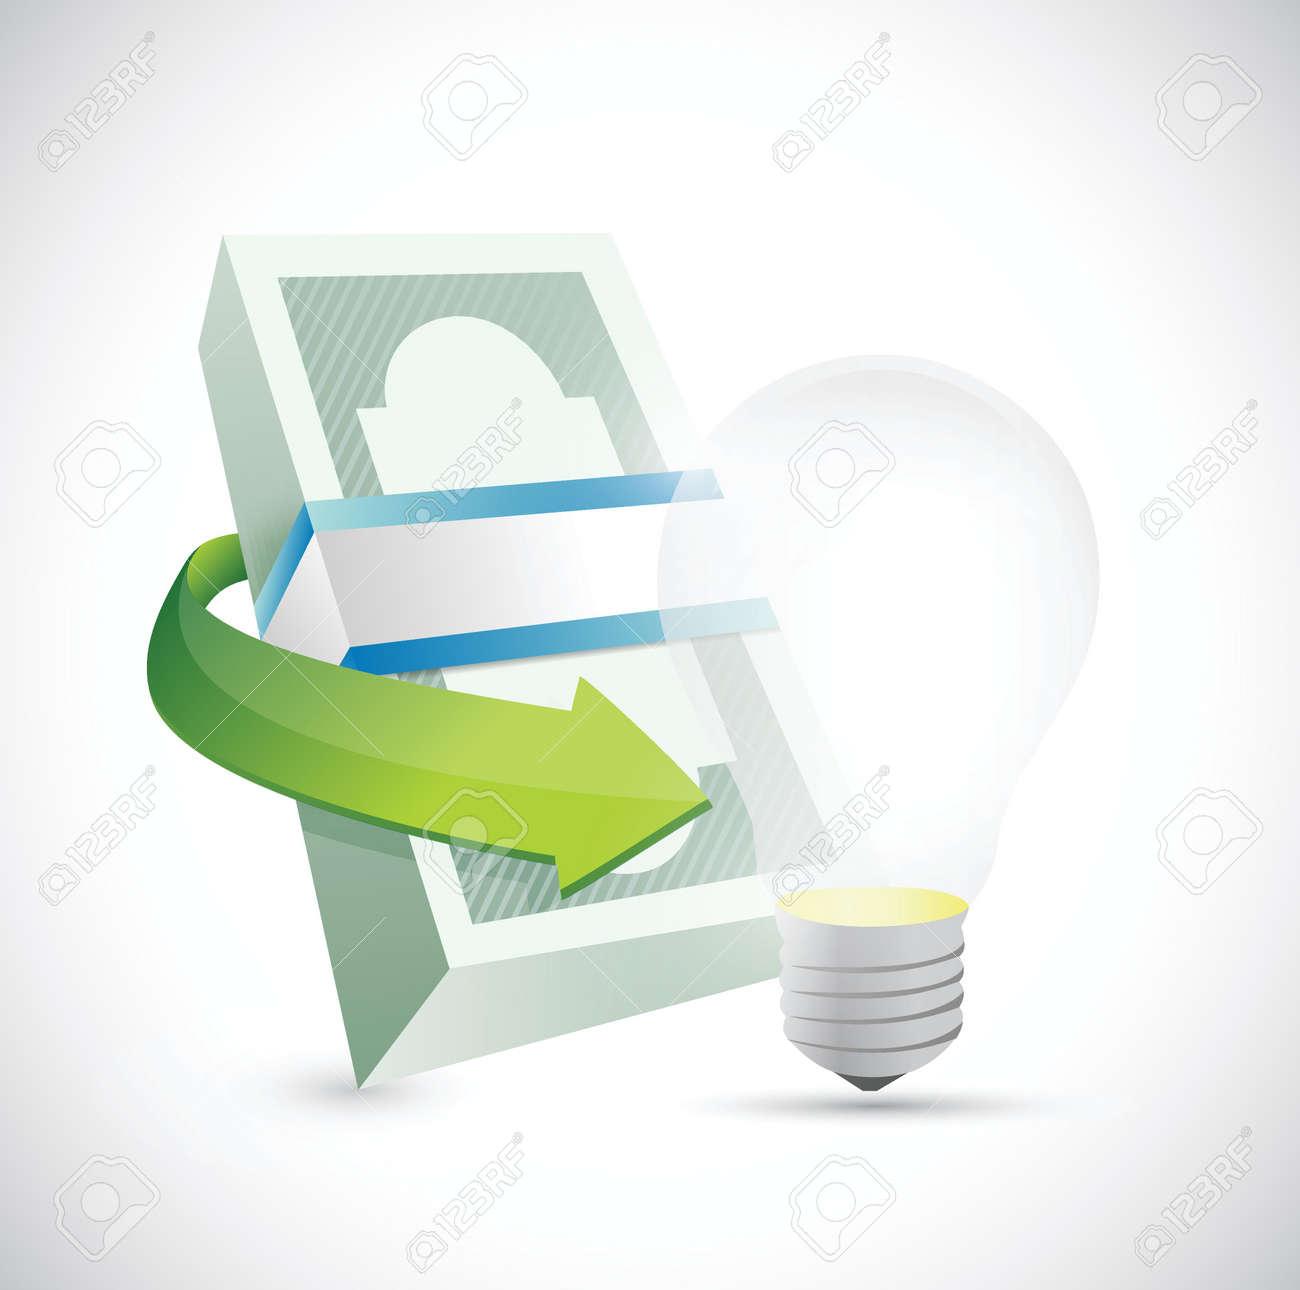 energy money concept illustration design over a white background Stock Vector - 24654771